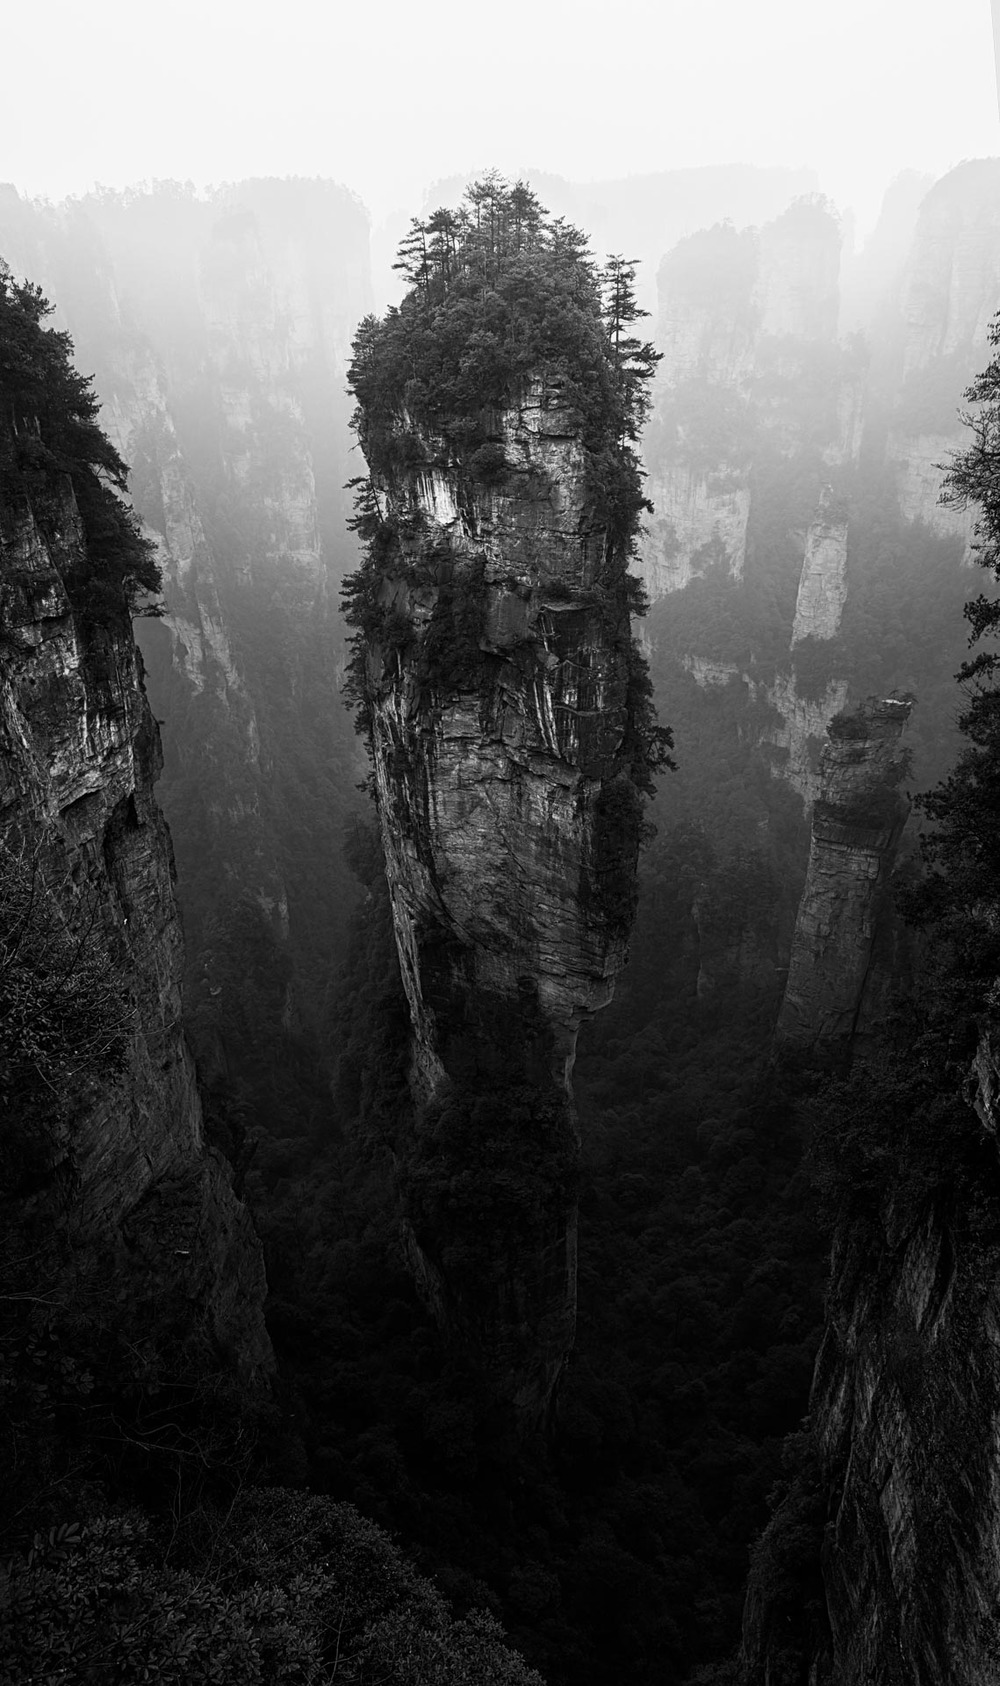 The Heavenly Pillar at Zhangjiajie. China